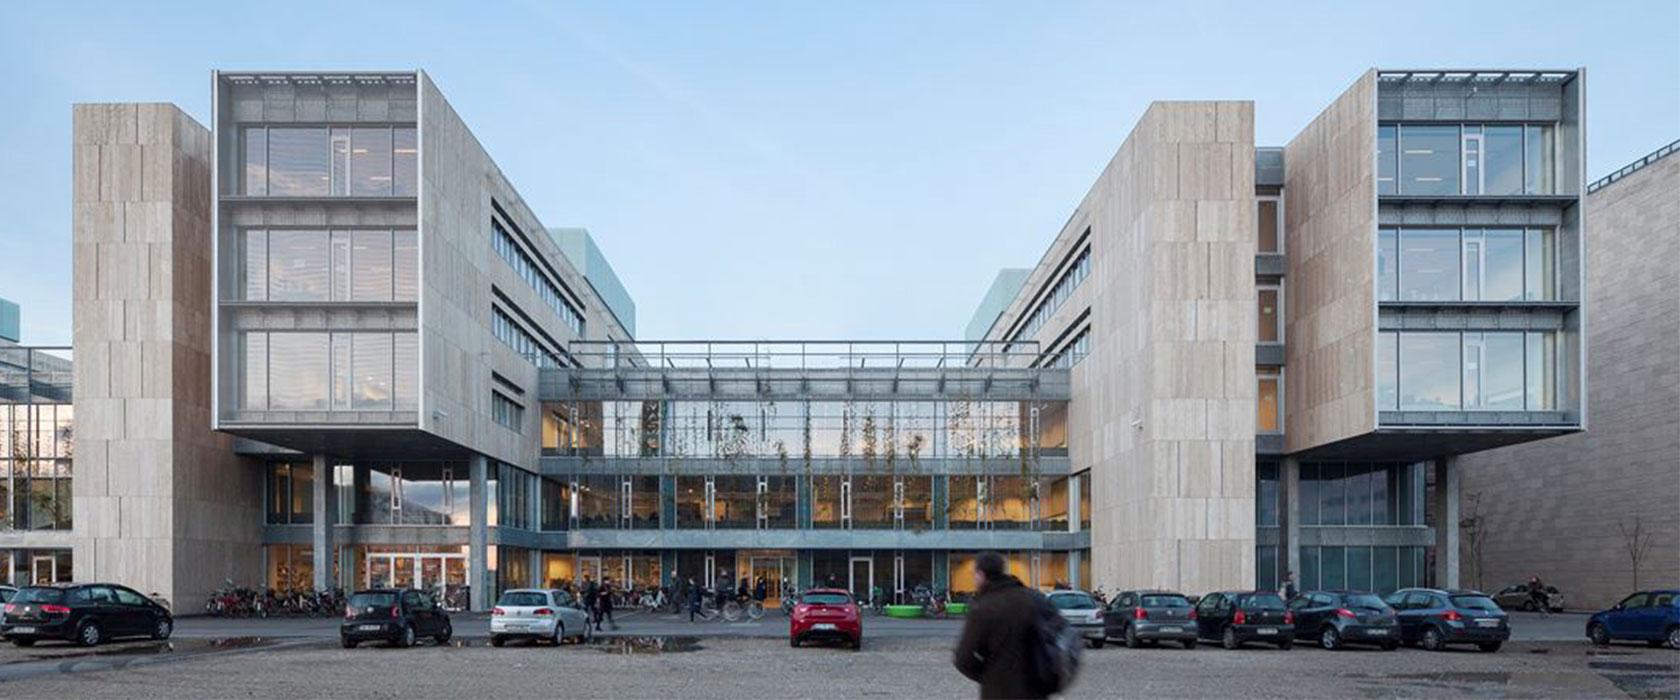 KU Sønder Campus facade